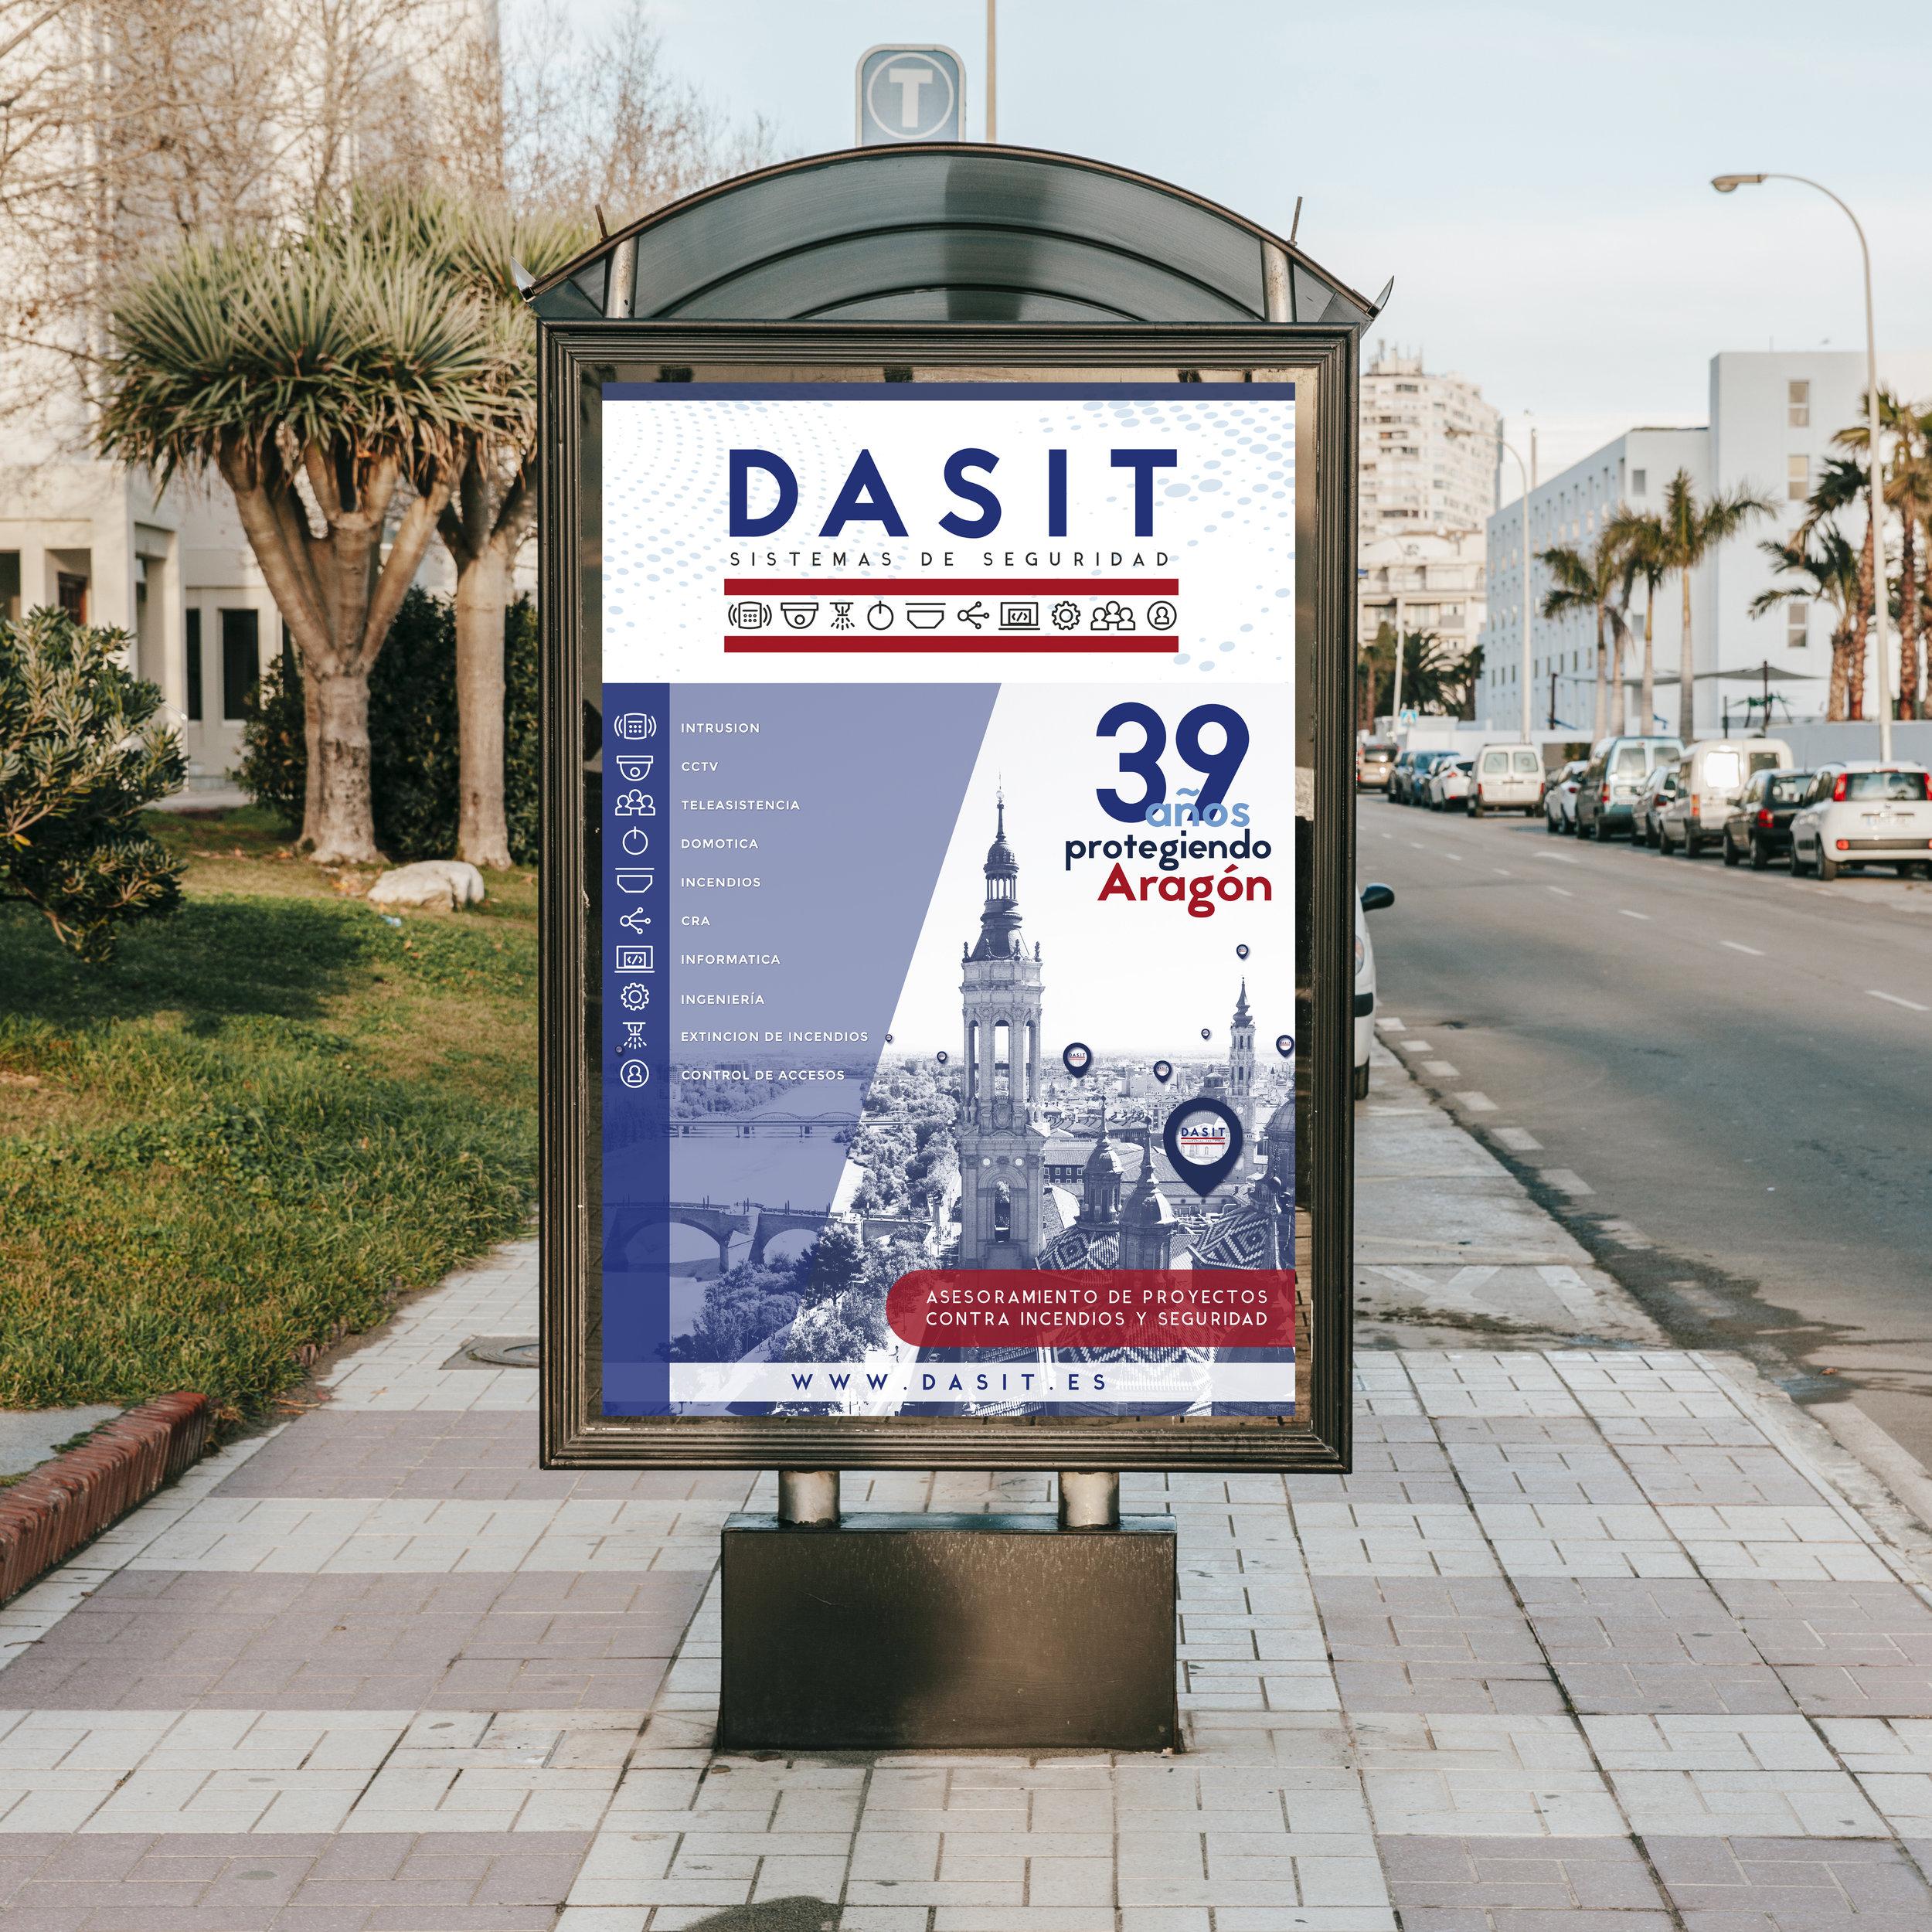 Dasit Poster Mockup 2.jpg